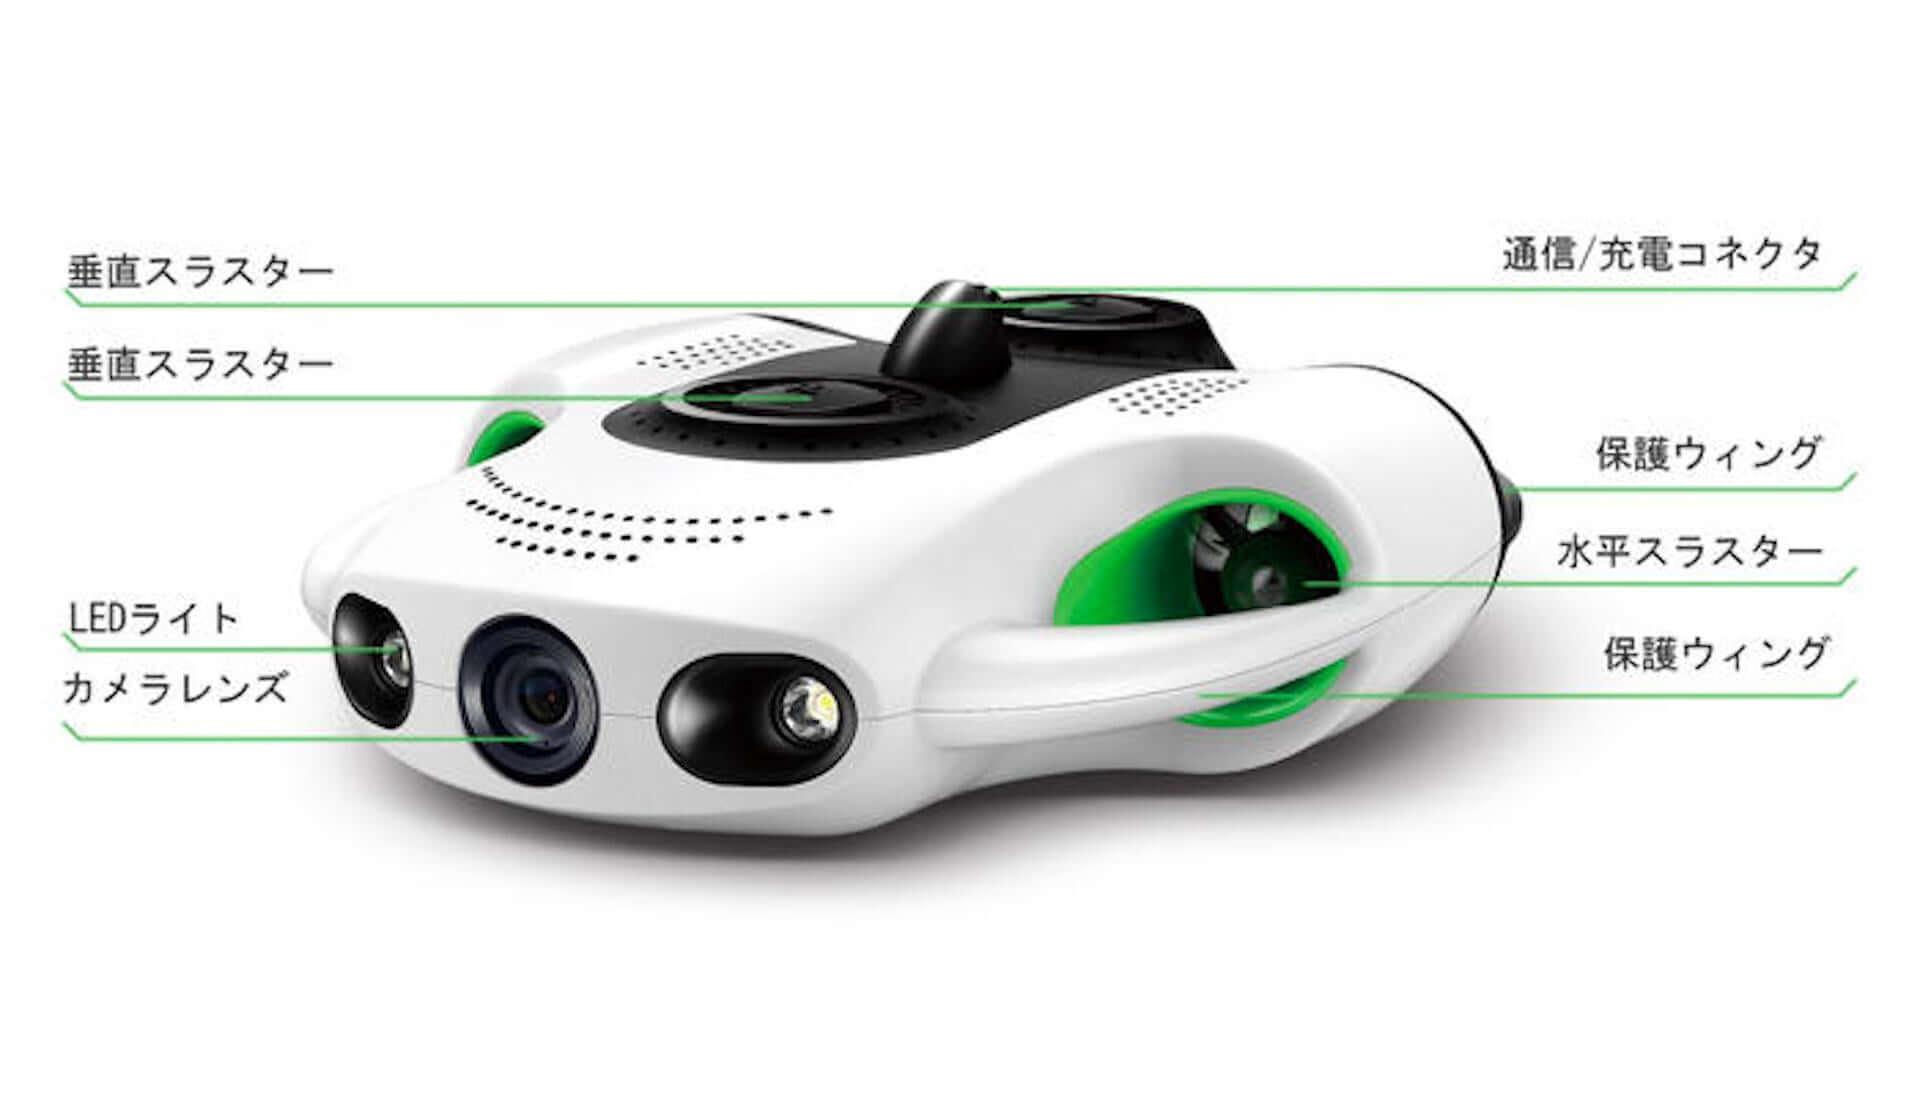 4Kカメラ&130度広角レンズ搭載の水中ドローン『BW Space Pro』がクラウドファンディングにて販売開始! tech200420_youcan_robot_5-1920x1114